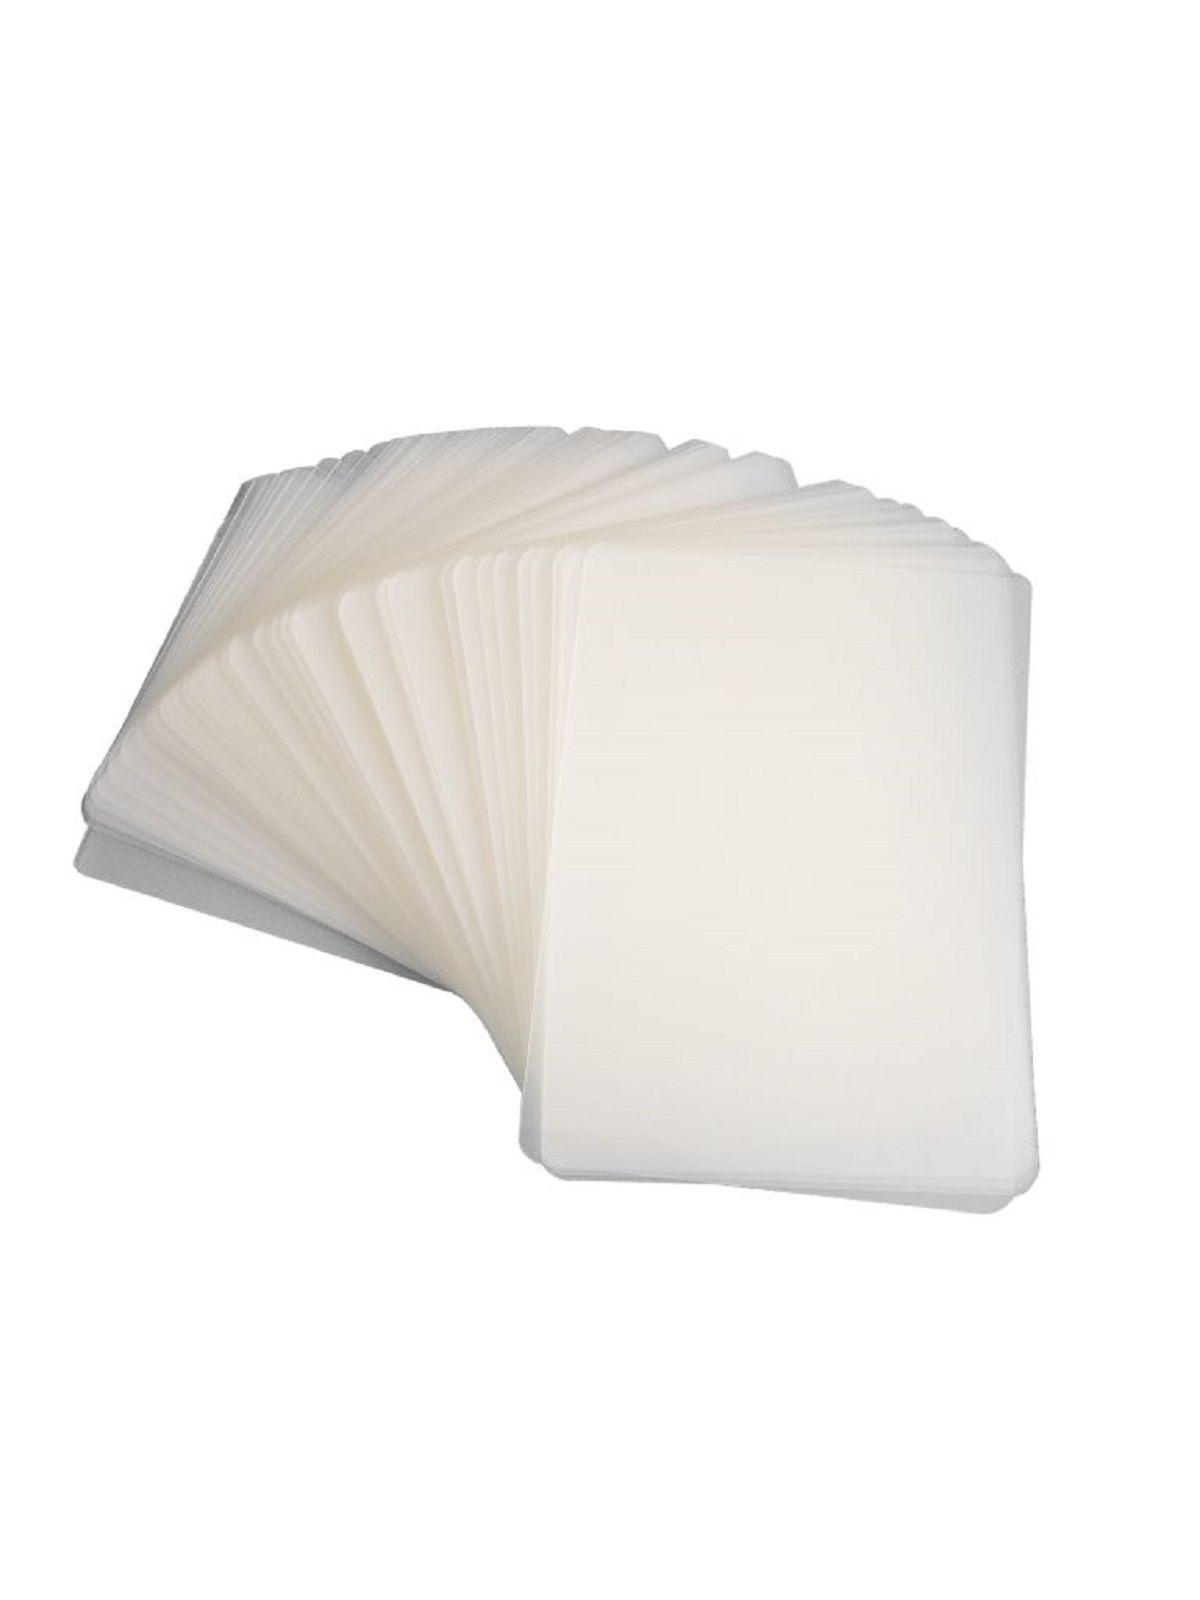 Kit 1000 Plásticos Polaseal para Plastificação CNPJ 121x191x0,05mm (125 micras)  - Click Suprimentos